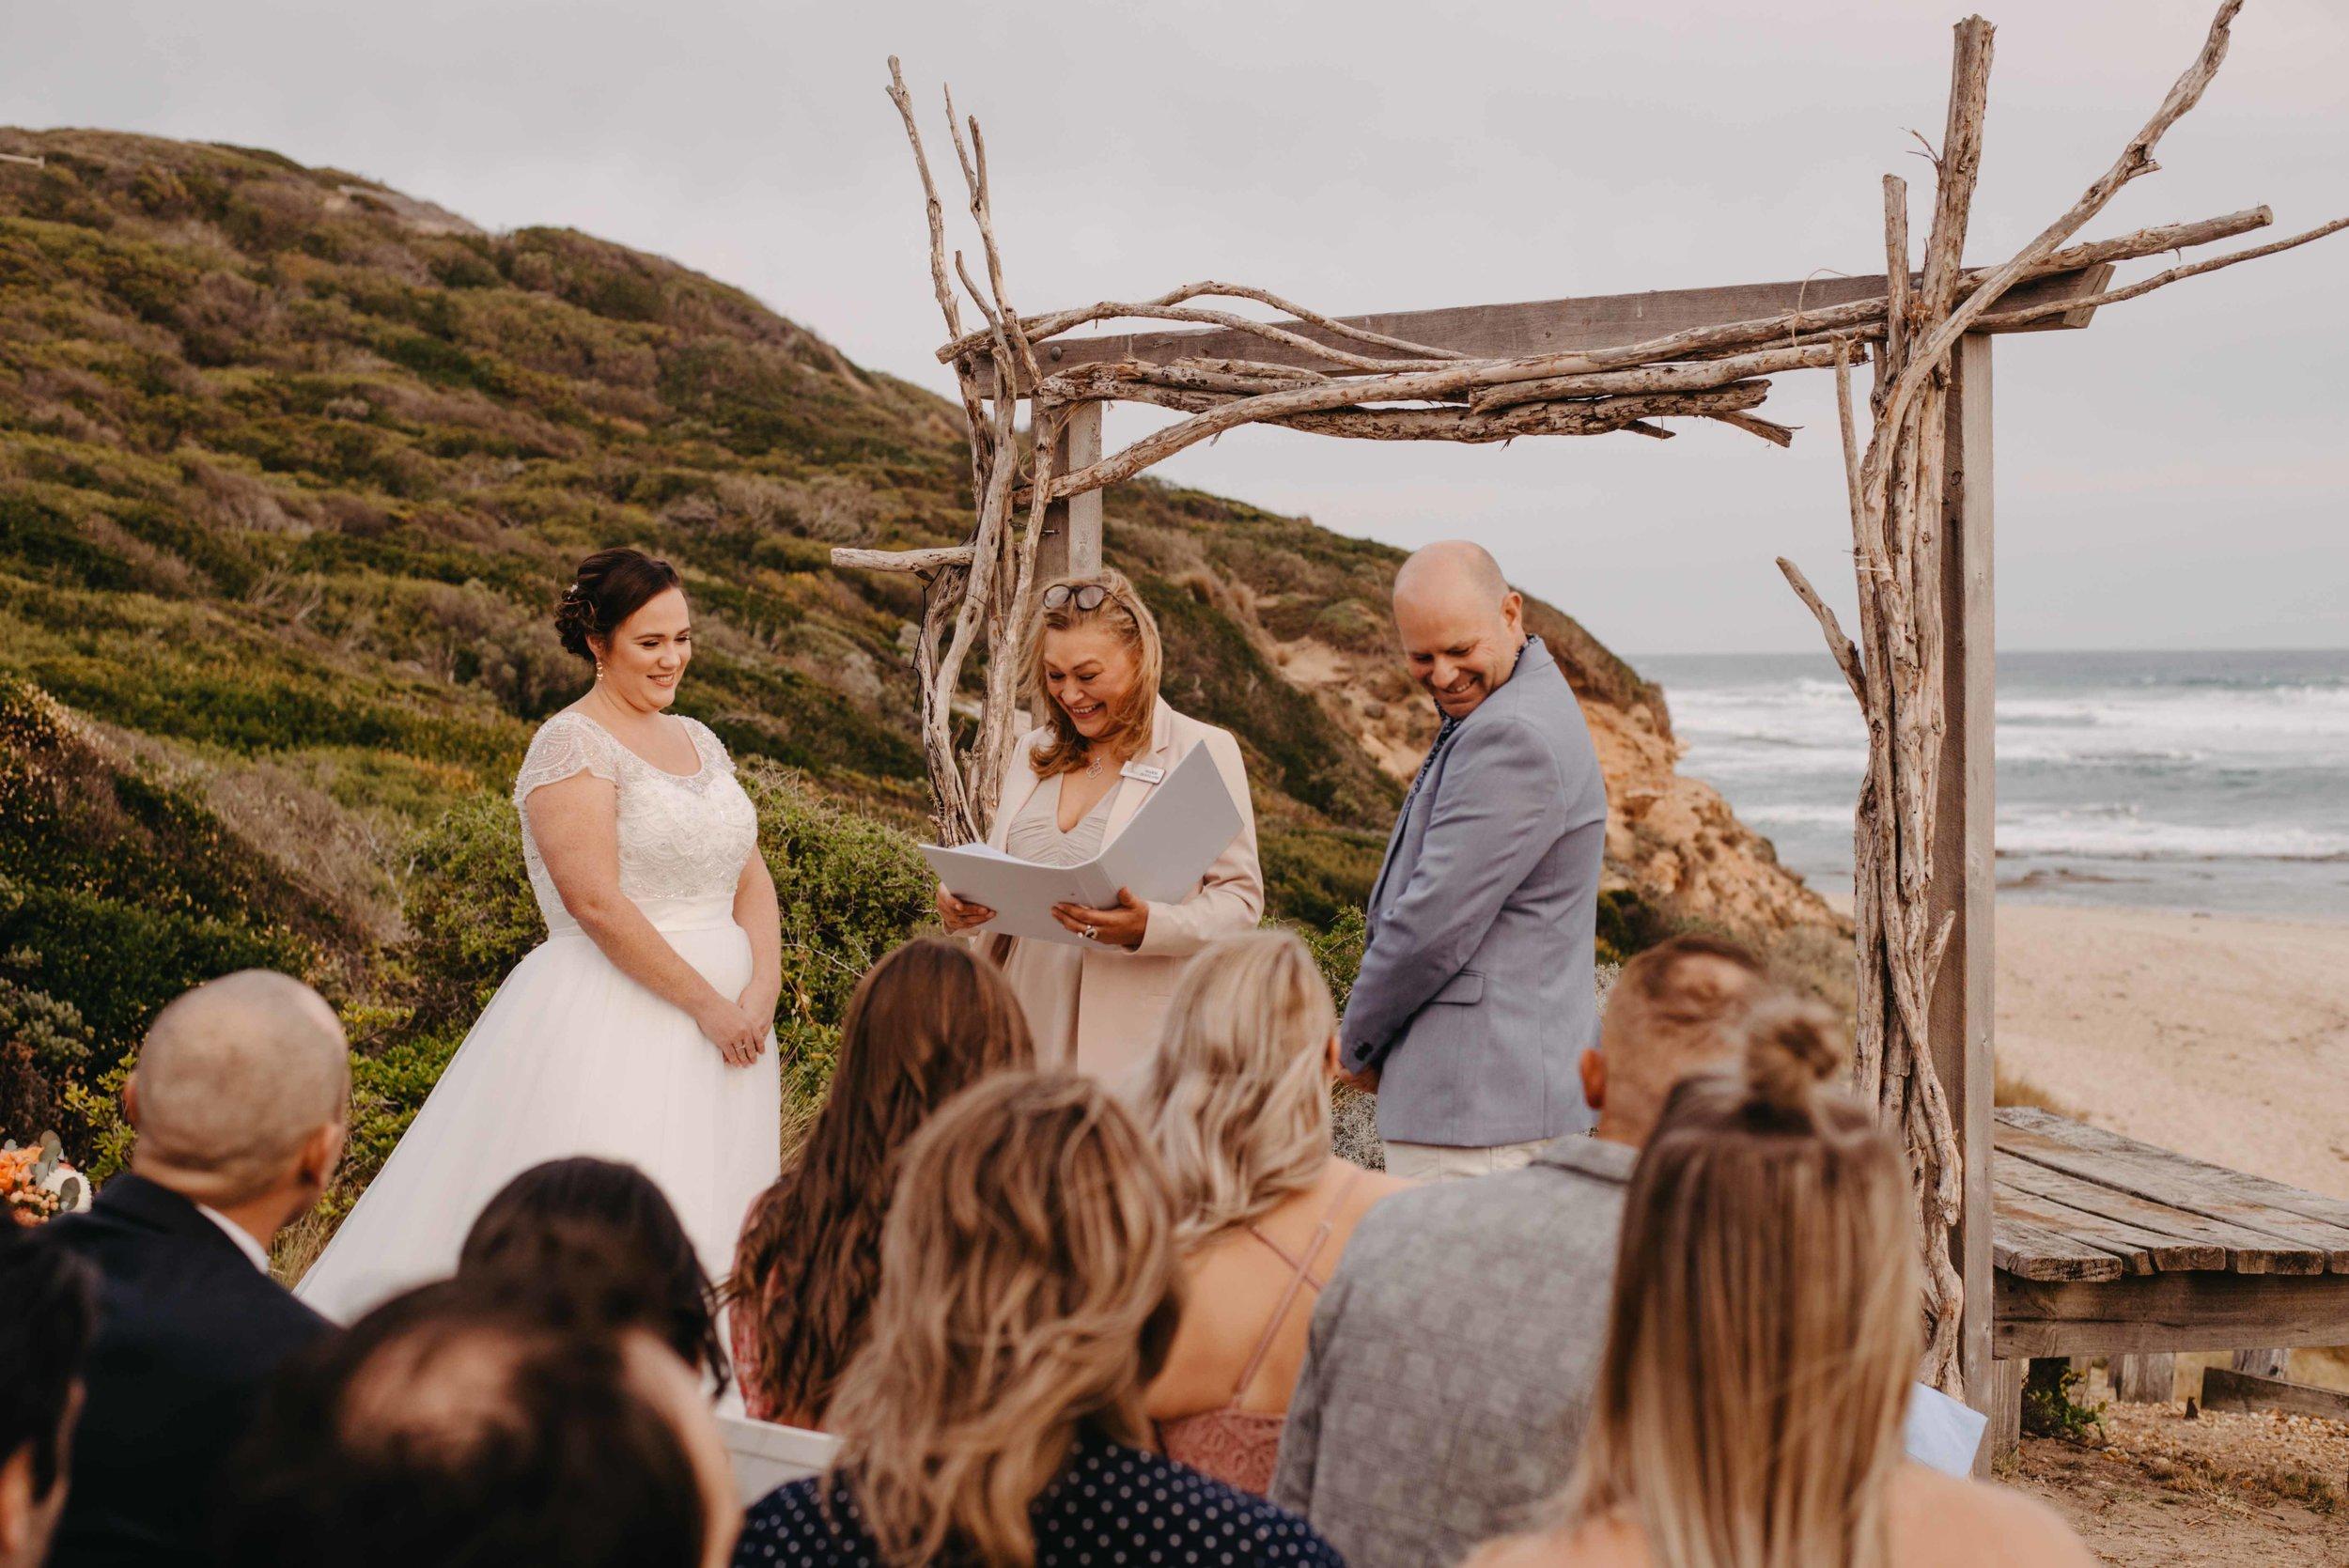 All-Smiles-Sorrento-Wedding-photography-sorrento-wedding-marissa-jade-photography-44.jpg